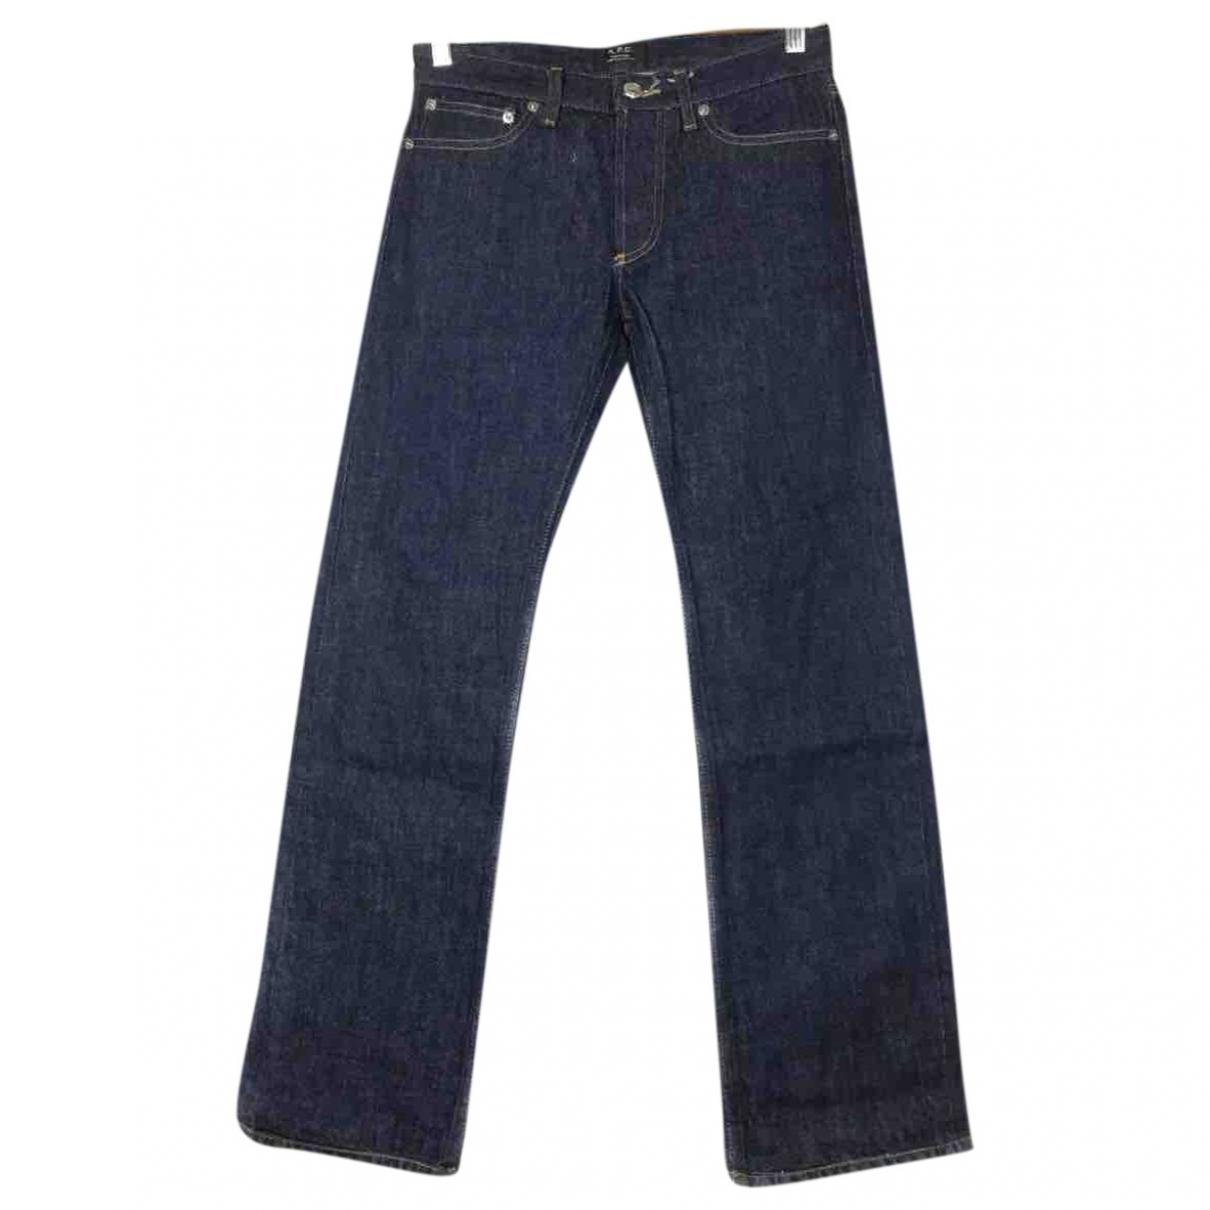 Apc \N Blue Cotton - elasthane Jeans for Women 26 US